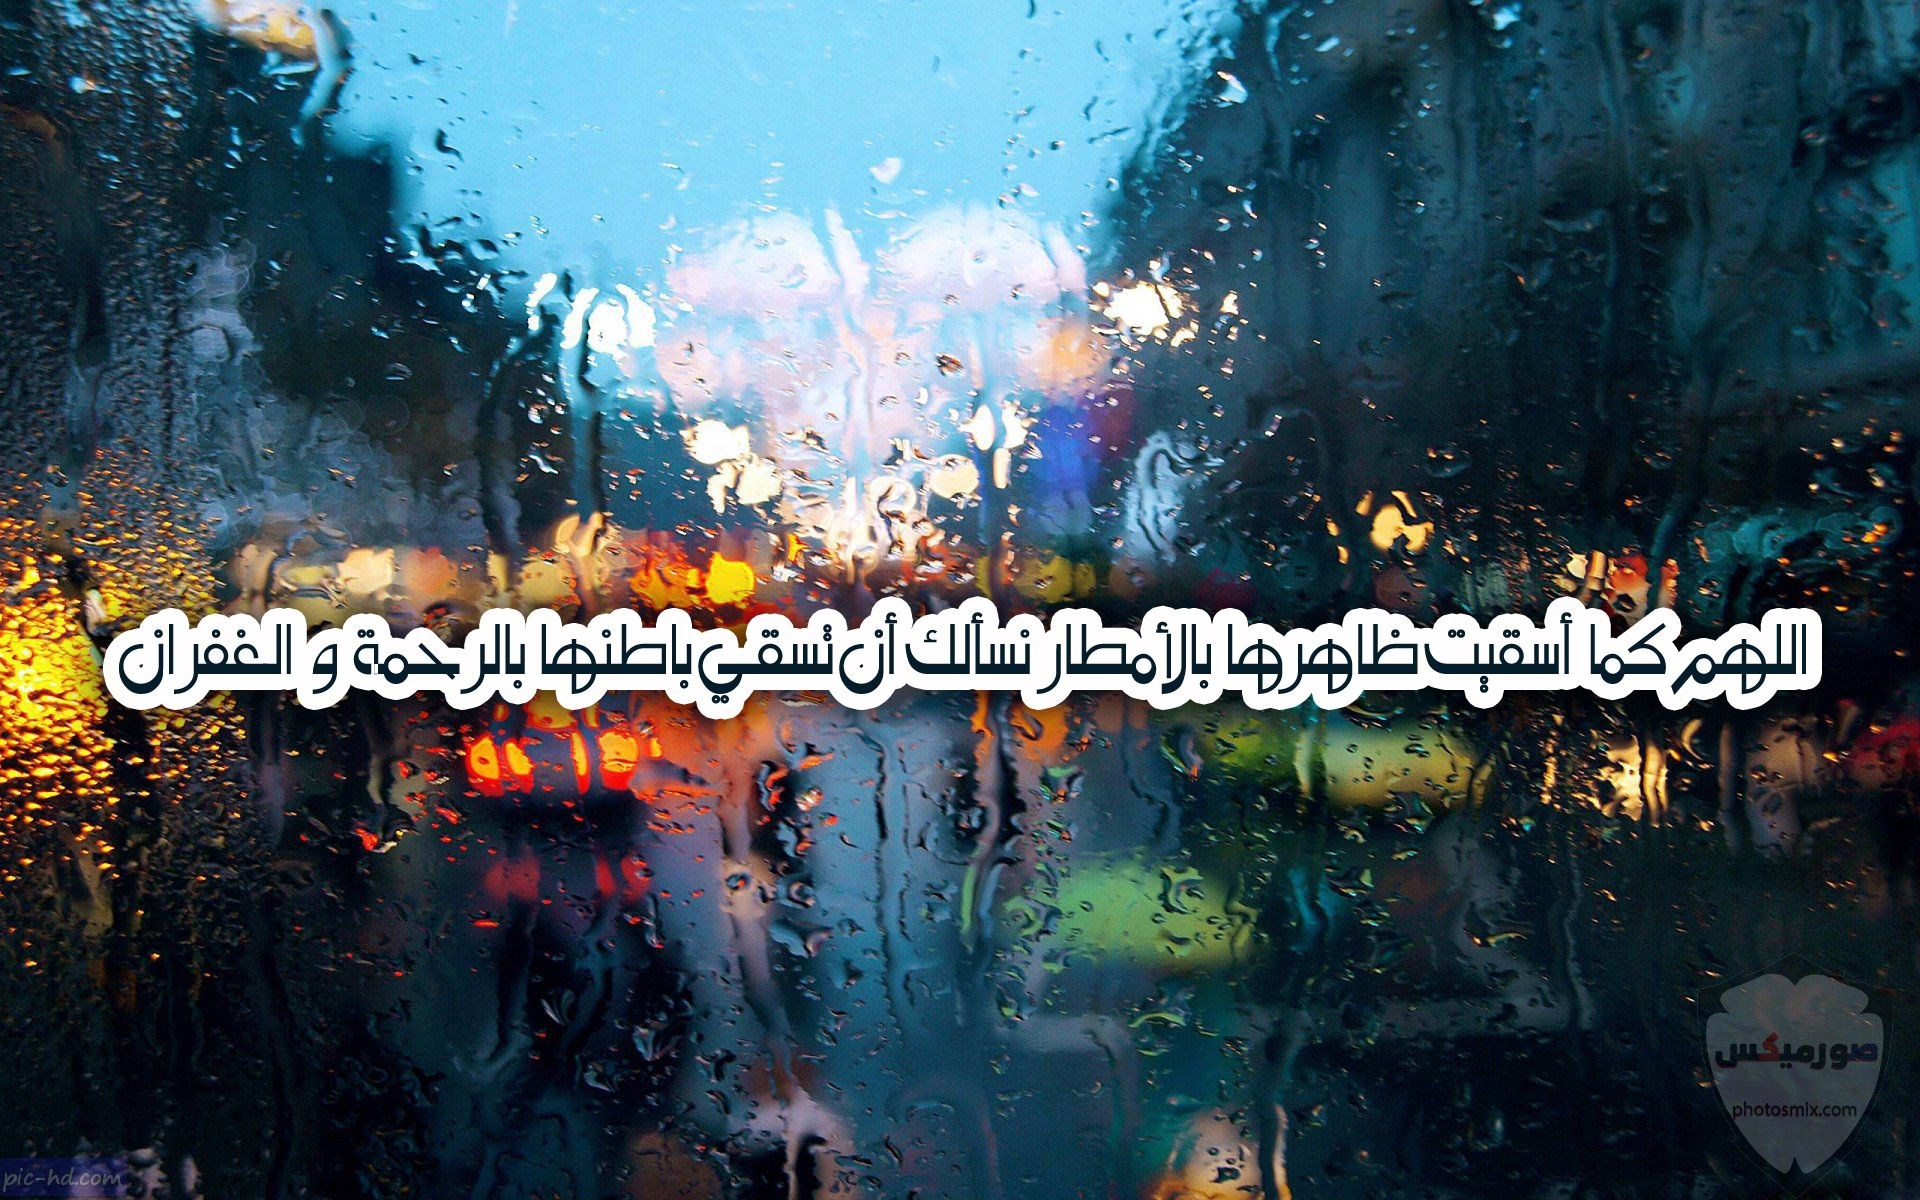 صور مطر جديدة 2020 photos rain خلفيات مطر 3 1